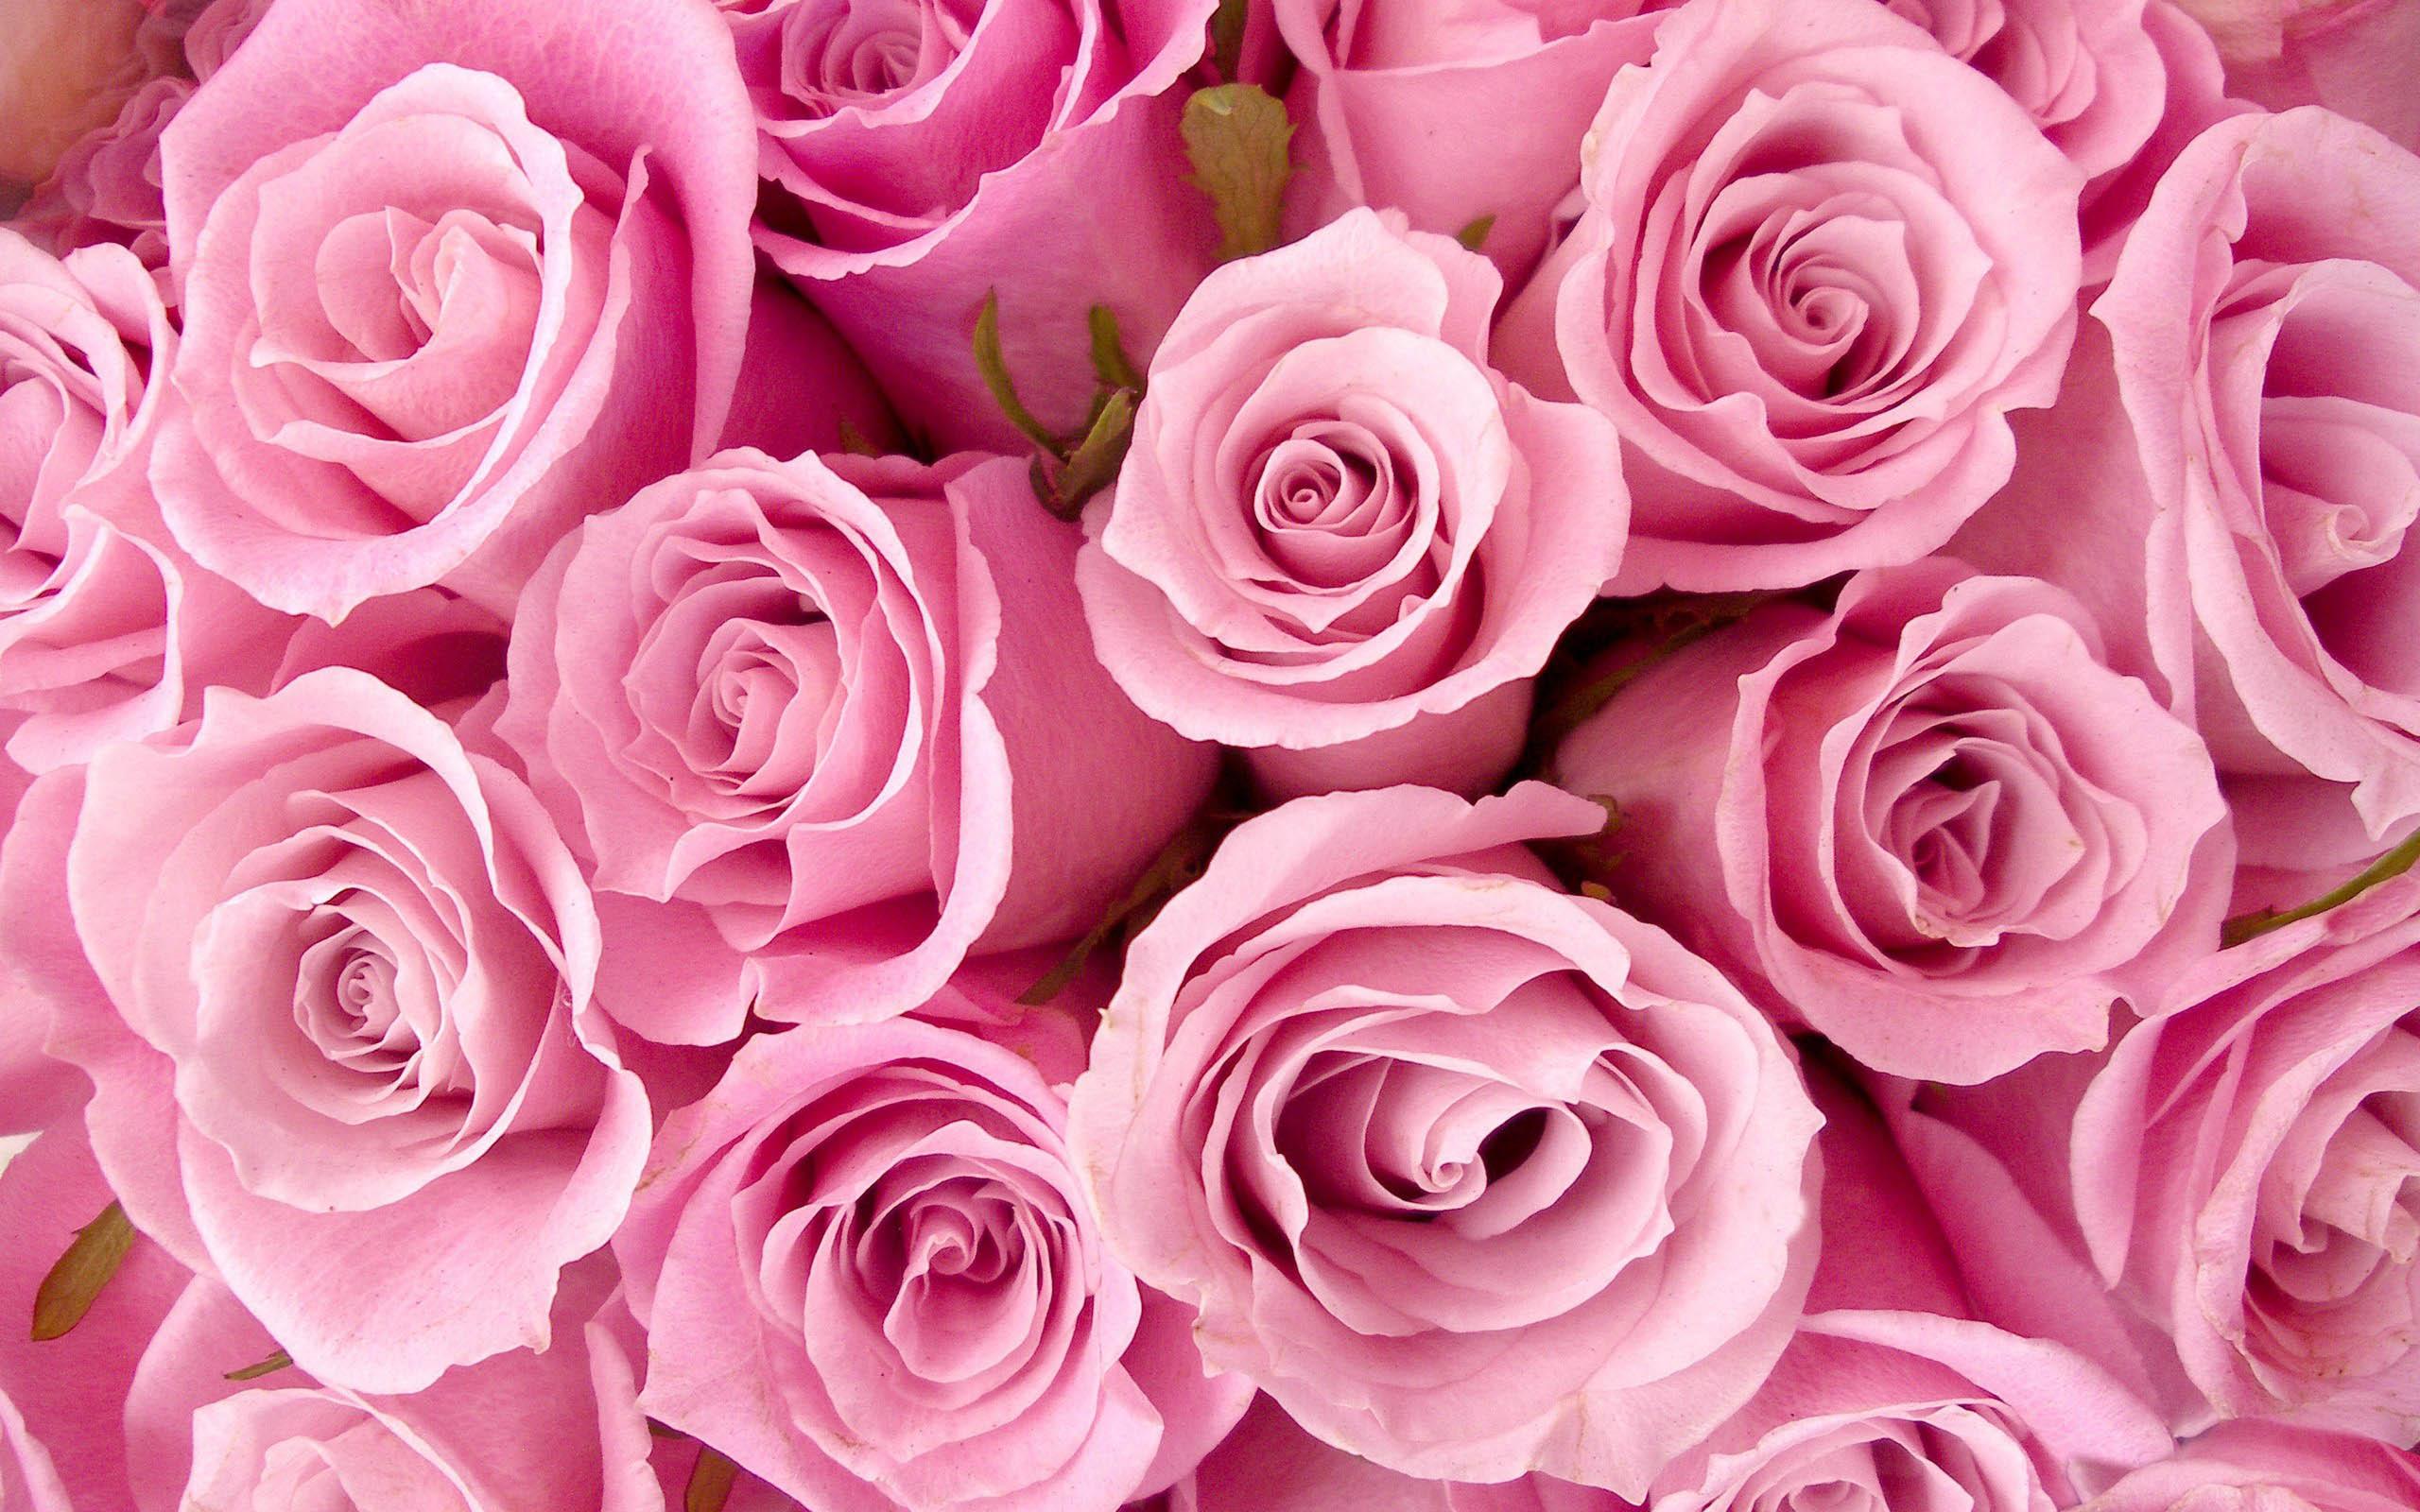 Цветы тема картинки